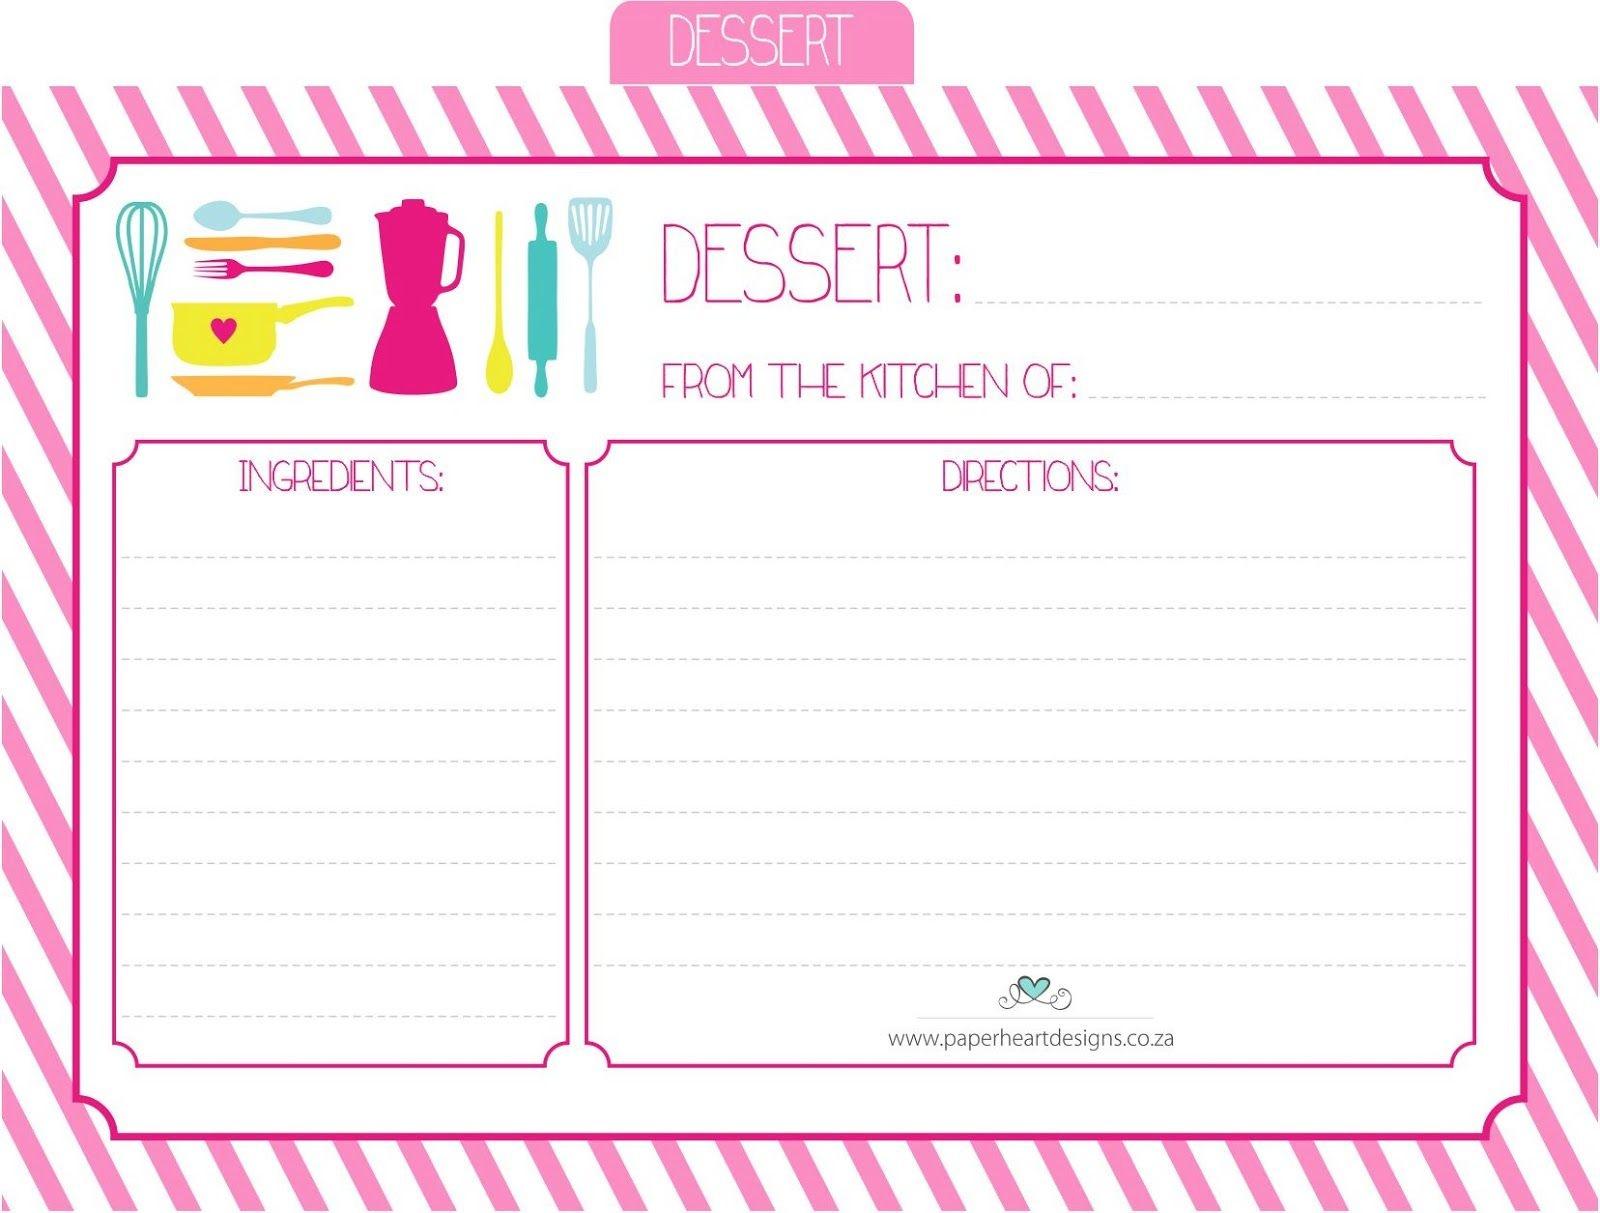 Paper Heart Designs - Free Printable Recipe Cards - Dessert - Free Printable Dessert Recipes